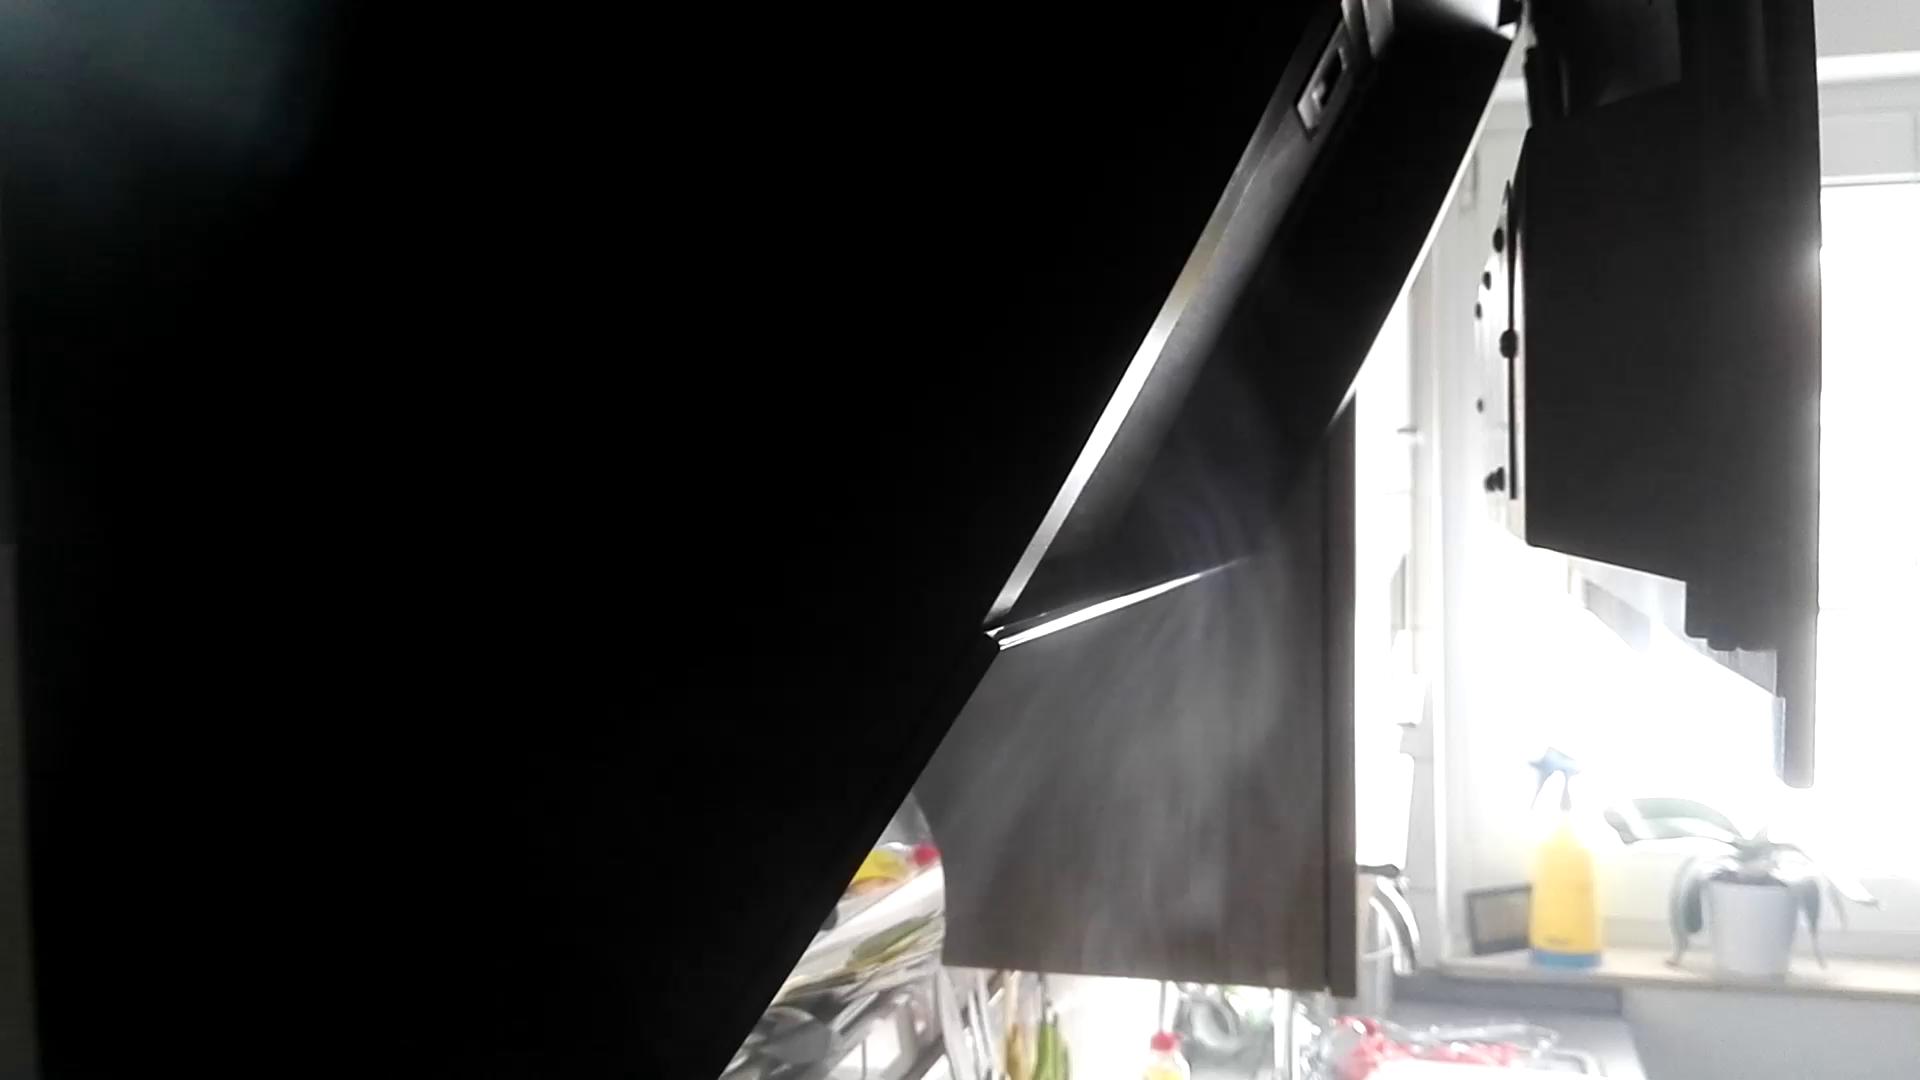 Bergstroem kopffreihaube dunstabzugshaube glas test: ᑕ❶ᑐ